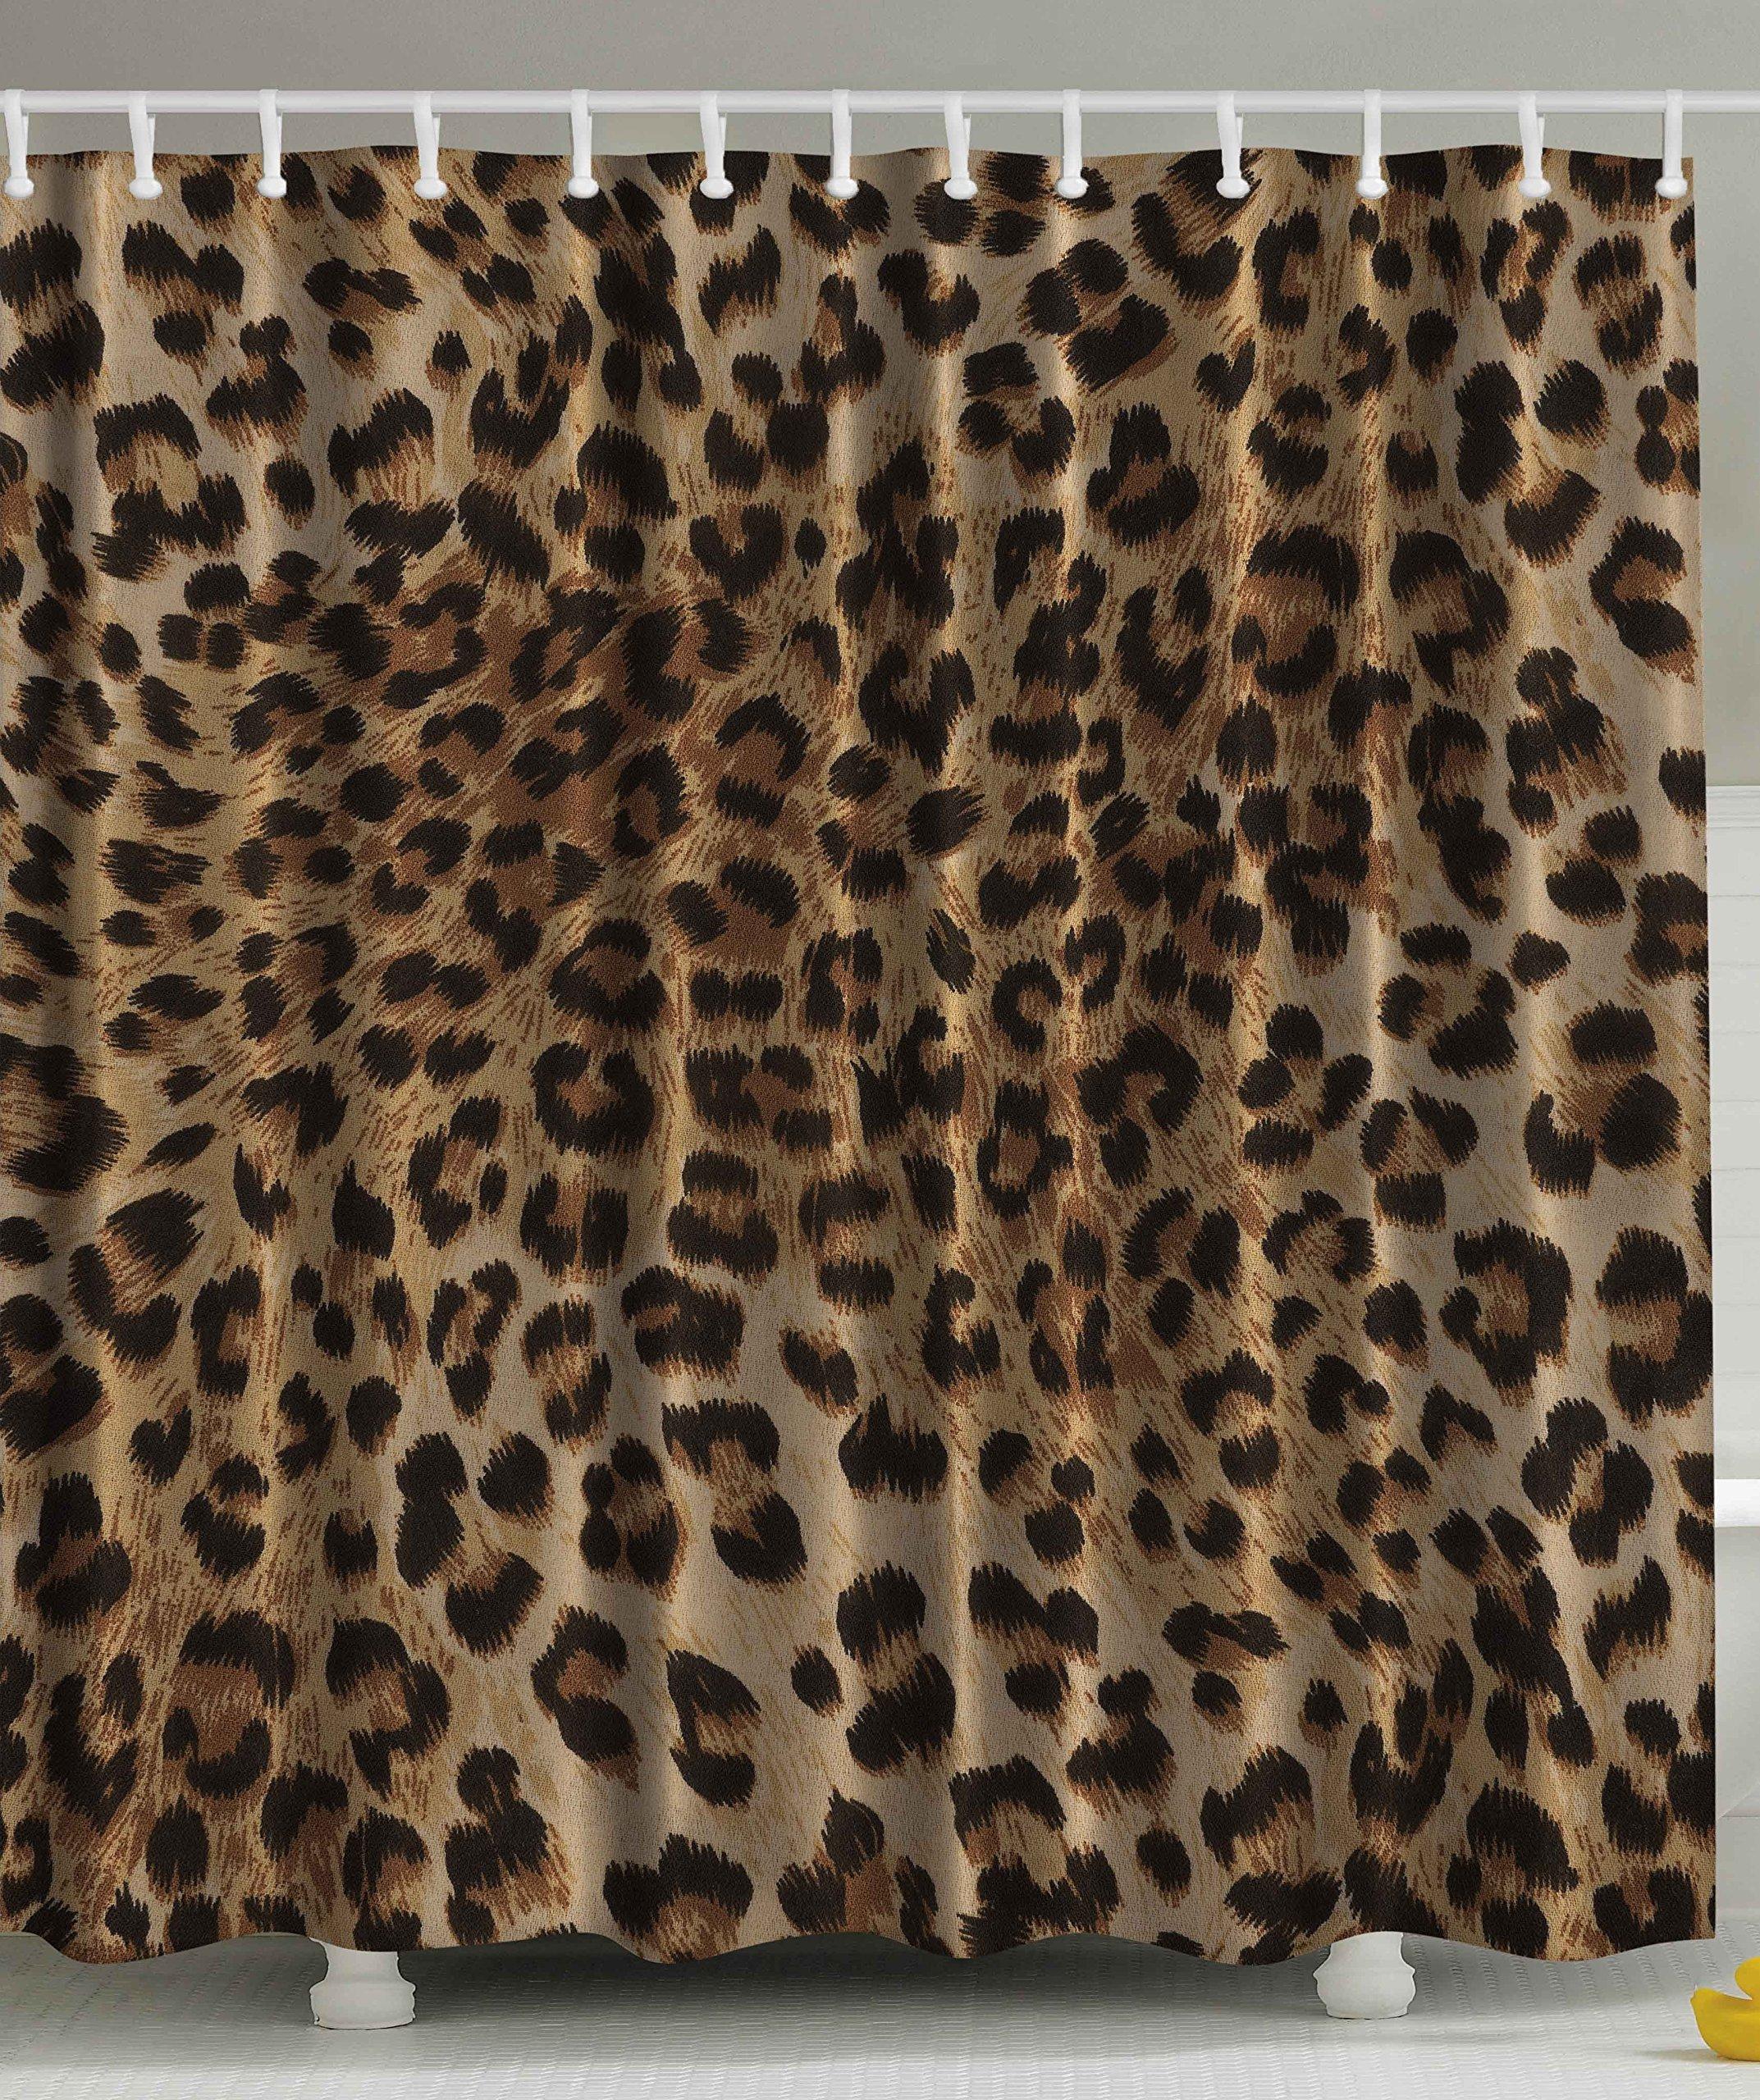 Ambesonne Bathroom Accessories Leopard Print Sexy Shower Curtain Nearly Natural Wildlife Safari Decorations Big Cat Theme Fur Skin Animal Black Brown